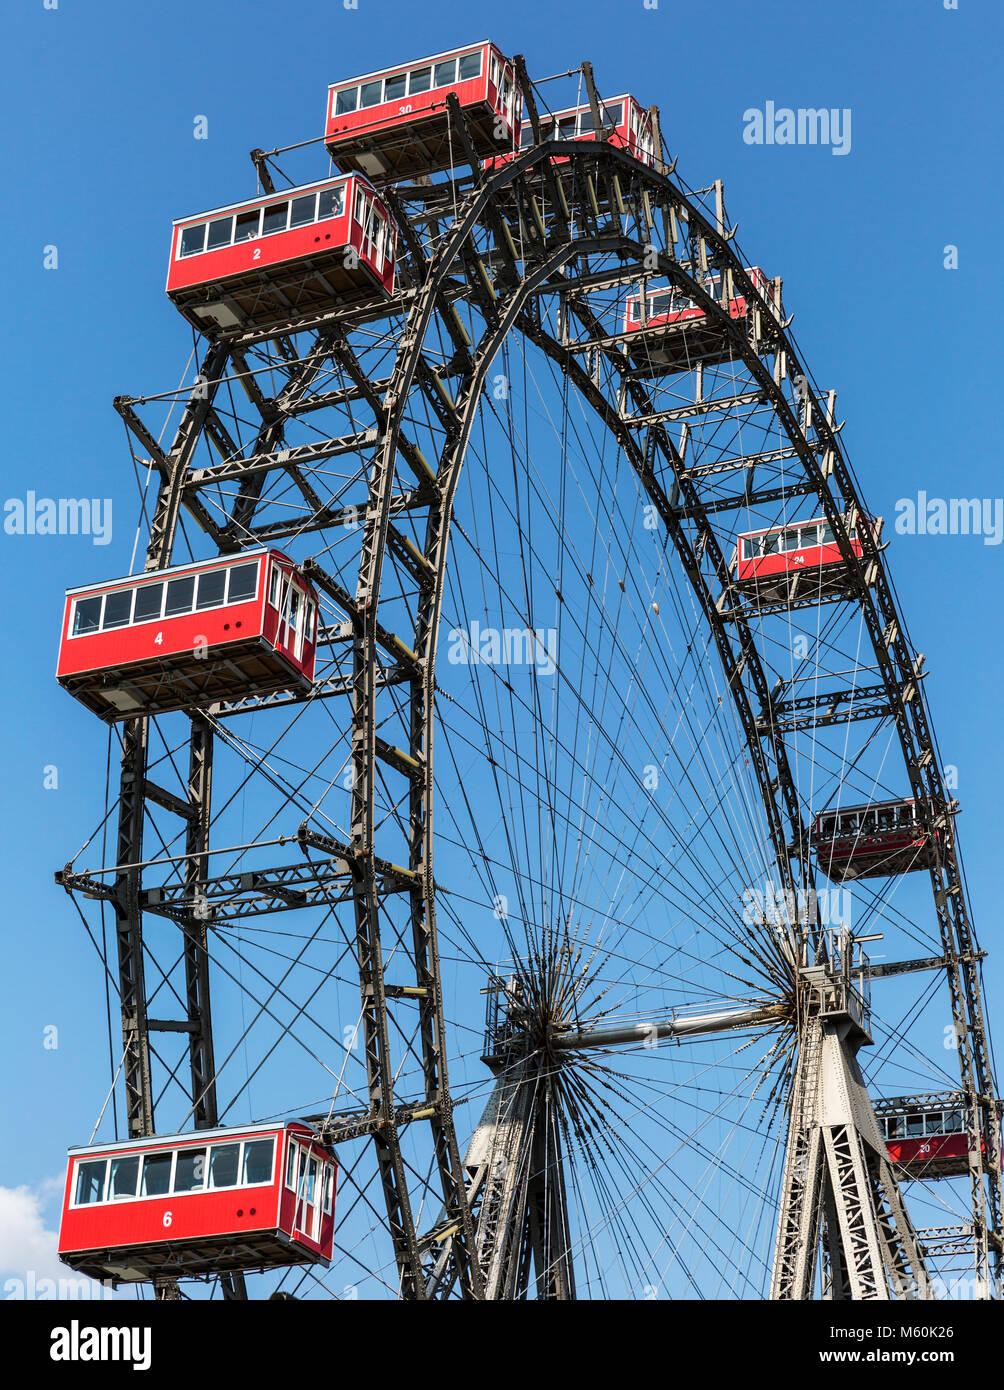 The Wiener Riesenrad Ferris wheel at Prater amusement park, Leopoldstadt, Vienna, Austria - Stock Image